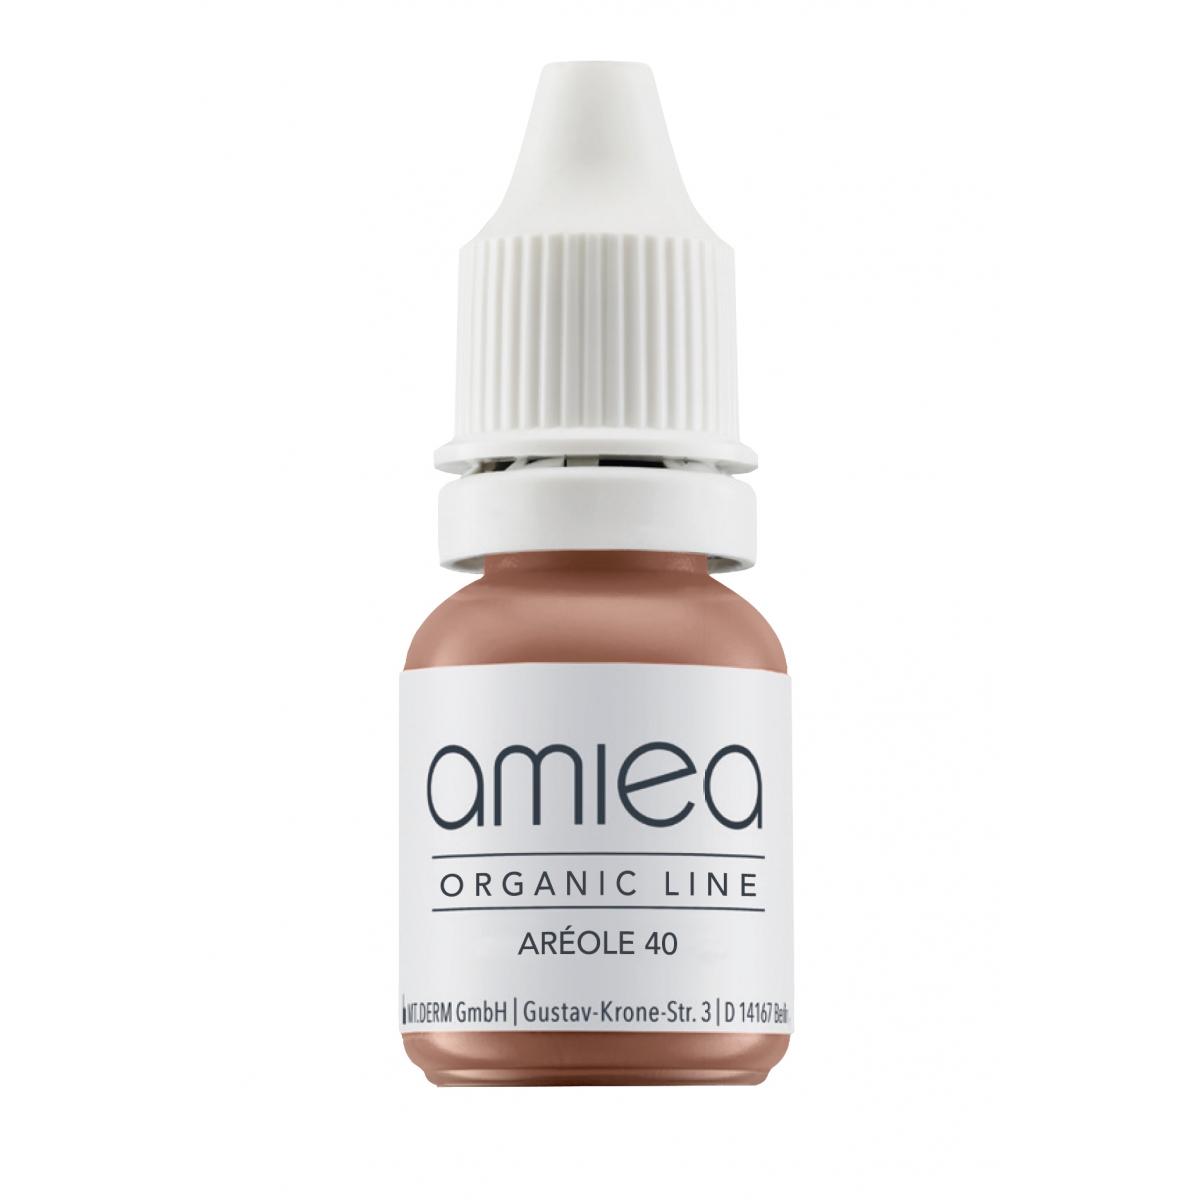 Organicline (5 ml)  - PIGMENTS AMIEA ORGANICLINE AREOLES 40, Flacon 5 ml